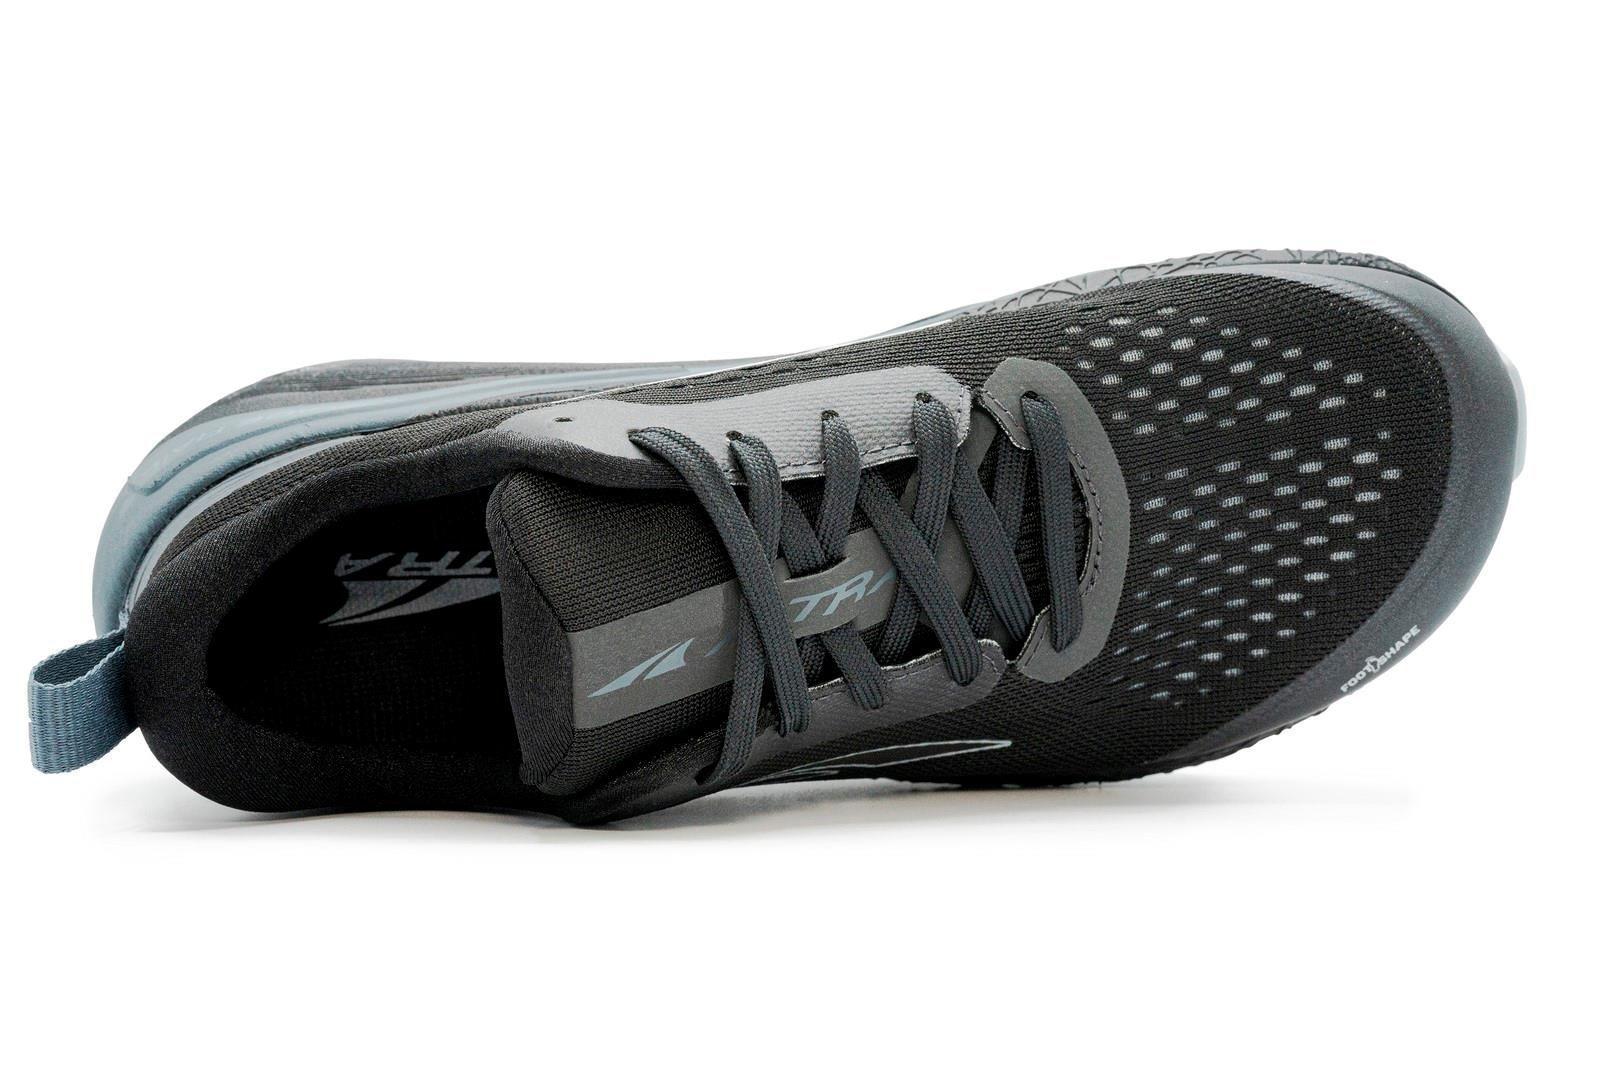 Altra Paradigm 5-W Black - Visningsexemplar, storlek EU 40 dammodell